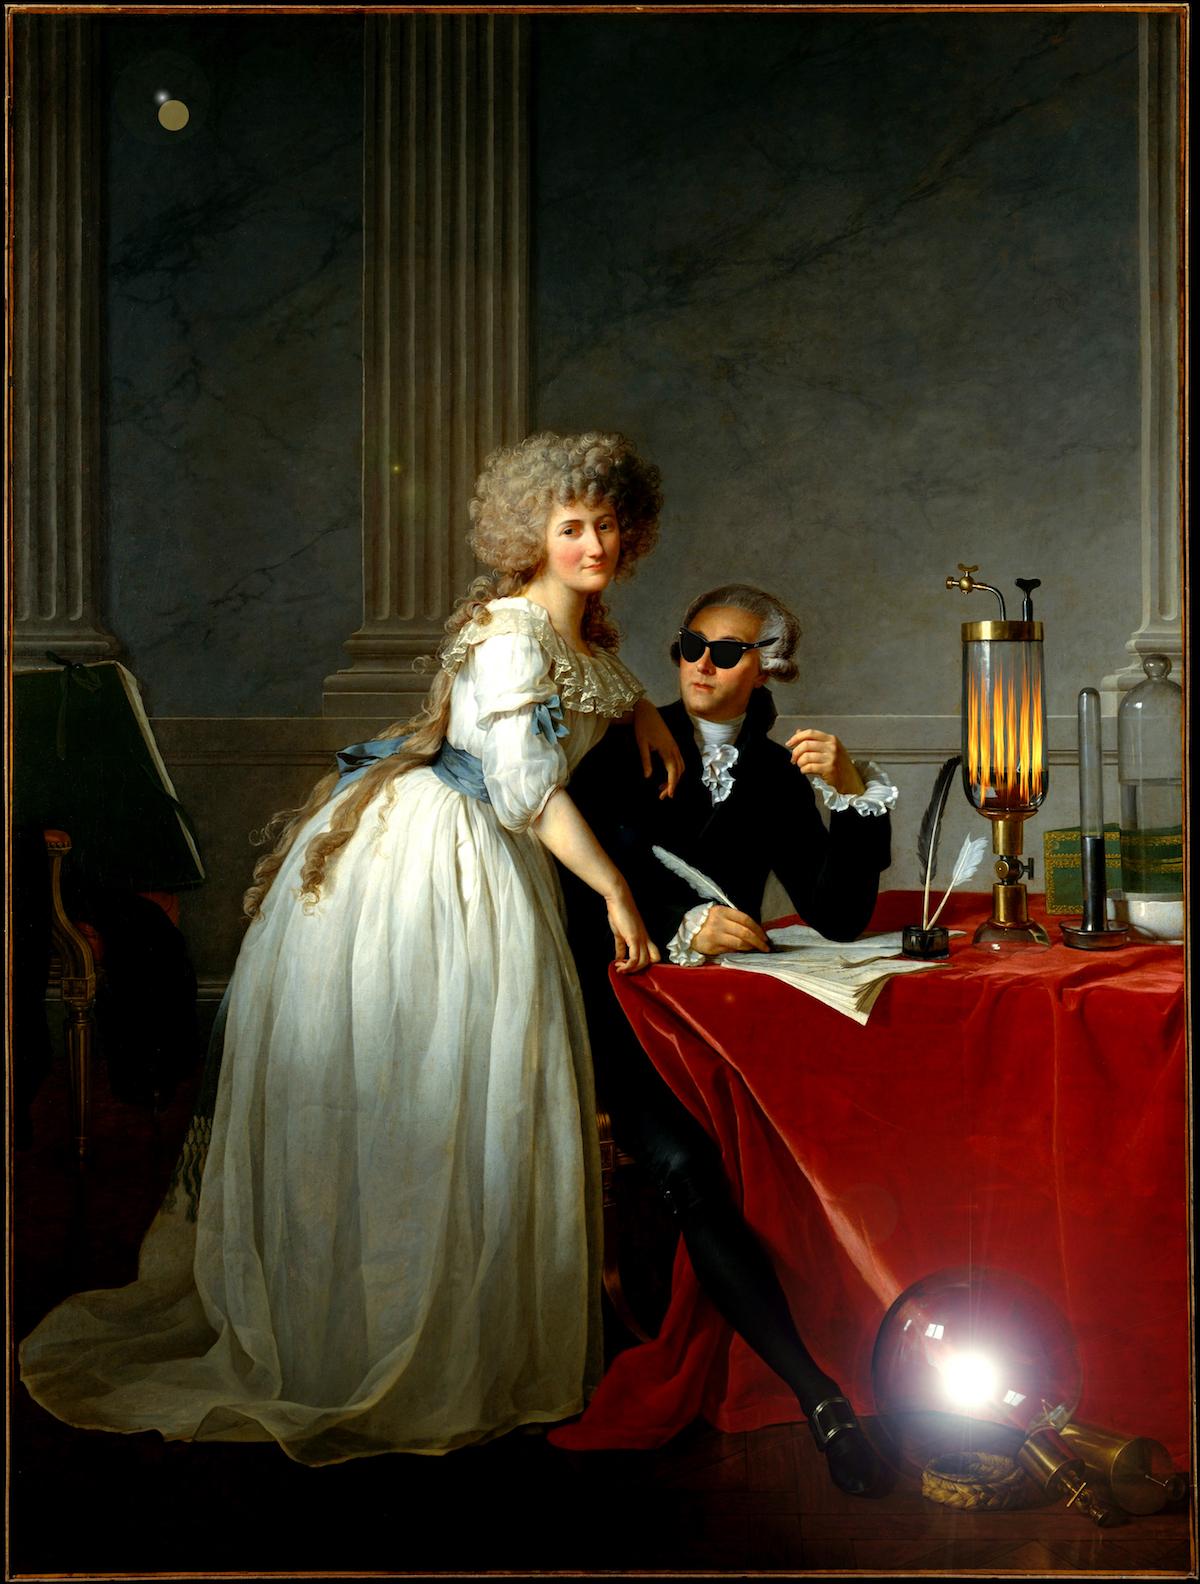 antoine-laurent-lavoisier-and-his-wife-marie-anne-pierrette-paulze-edit-1200